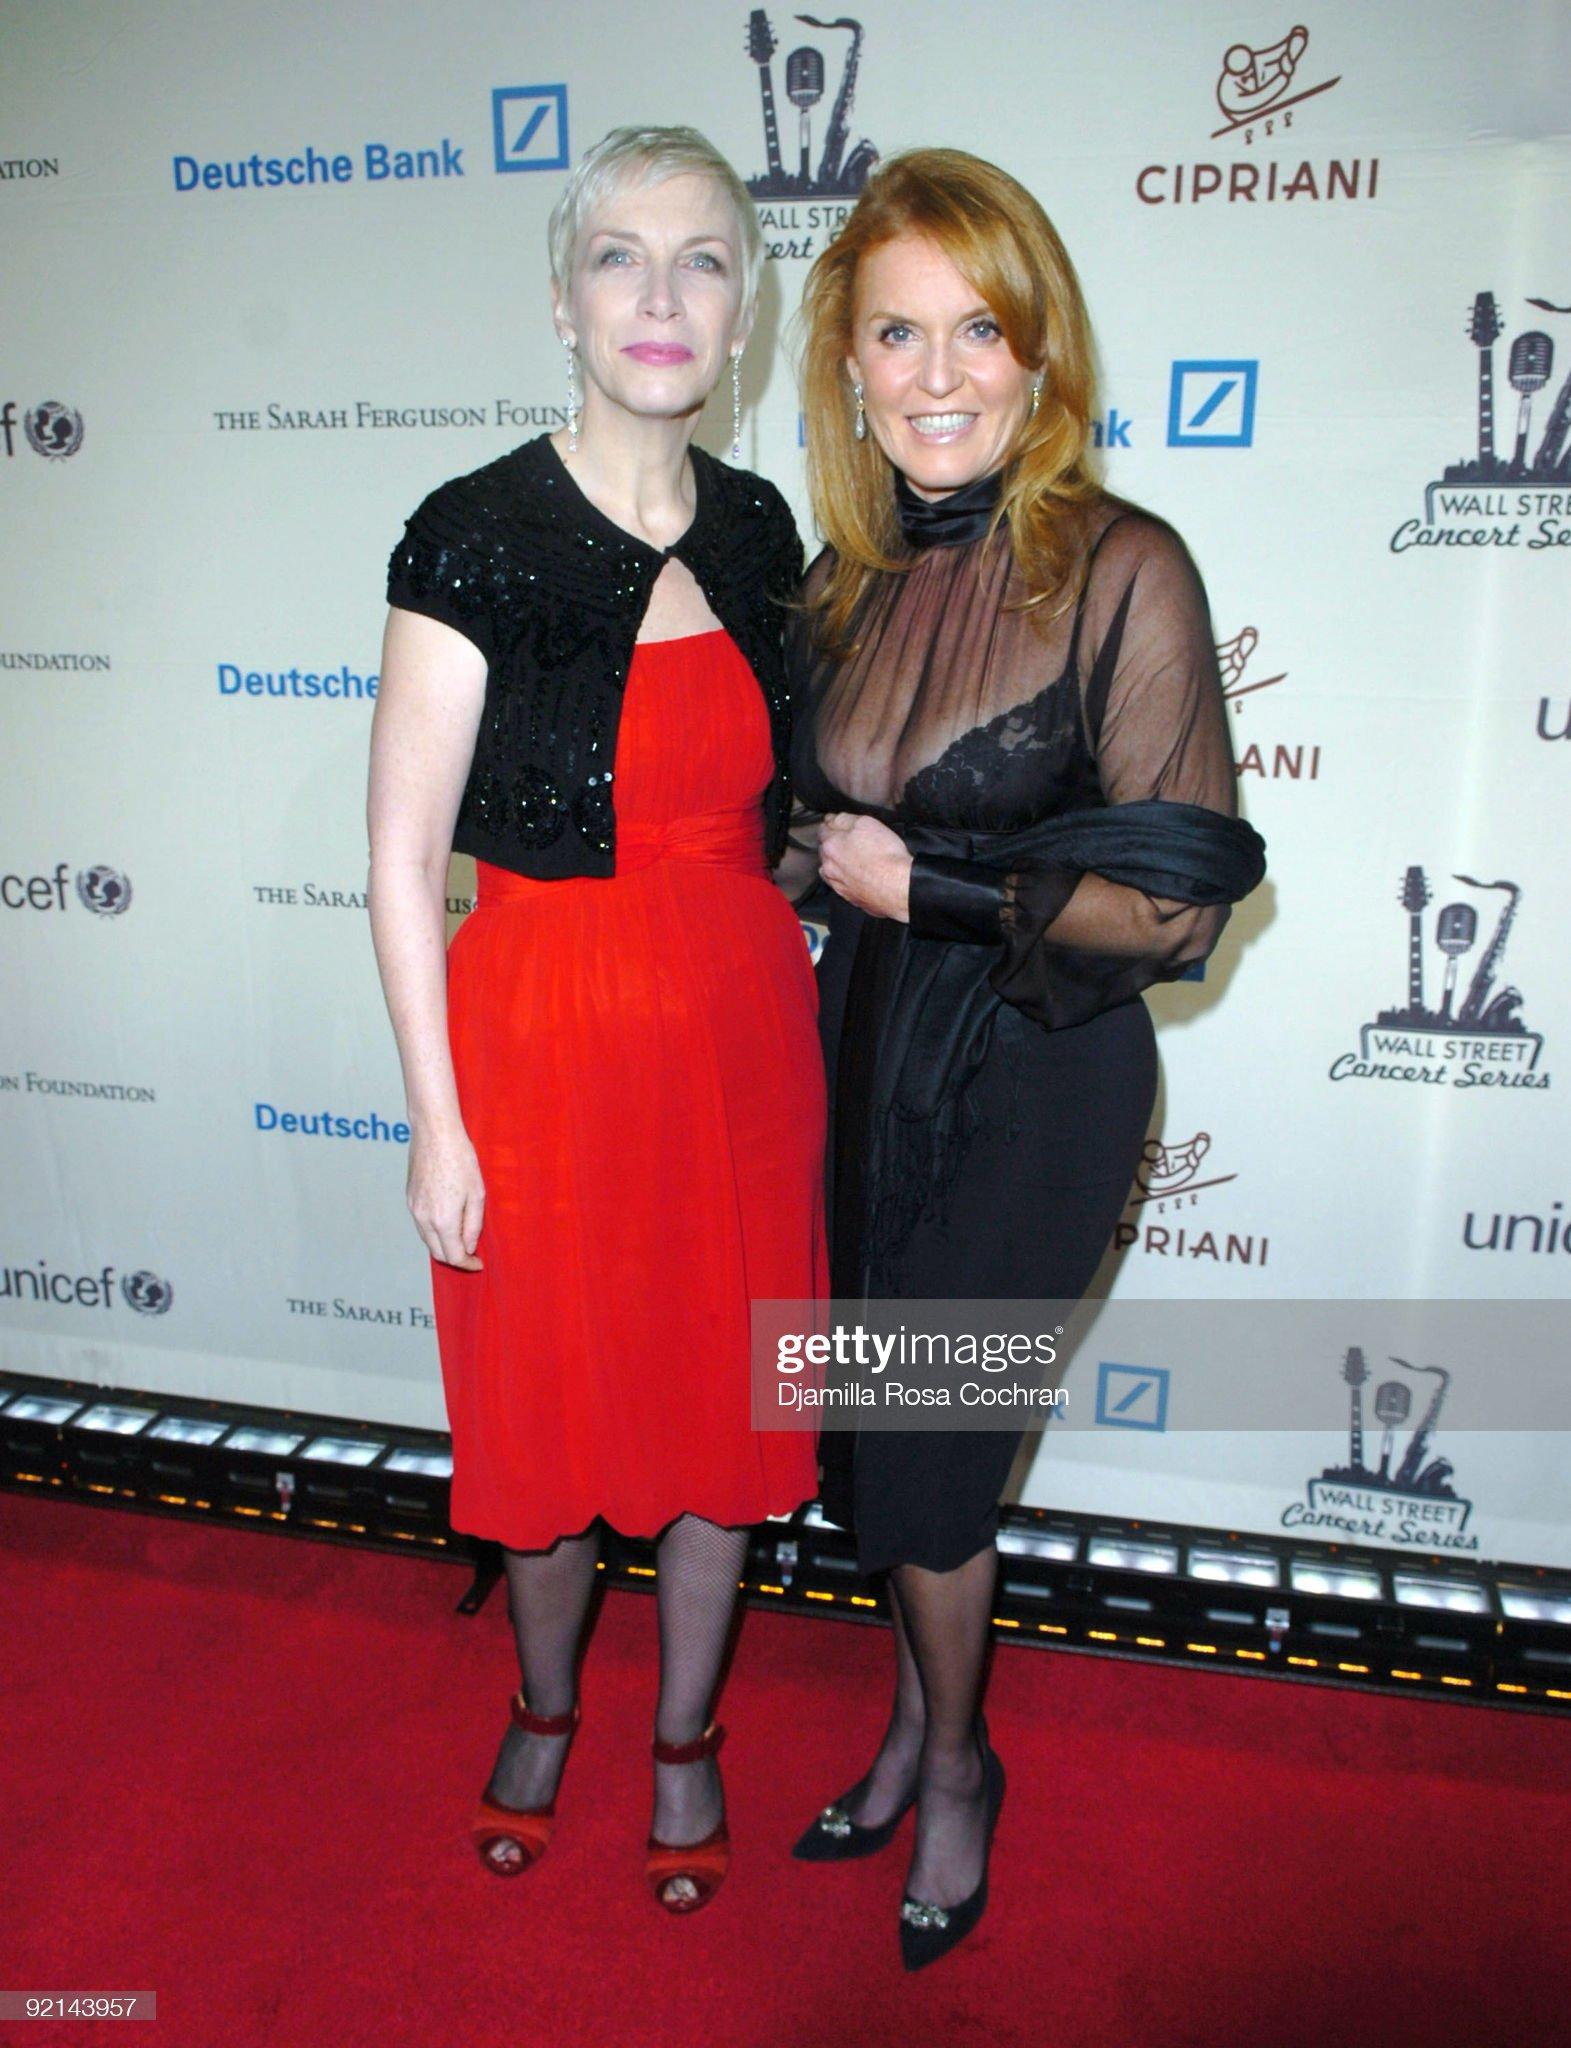 Вечерние наряды Отем пока еще Филлипс и Сары Йоркской 2007 Cipriani Wall Street Concert Series Presents Annie Lennox - Arrivals : News Photo